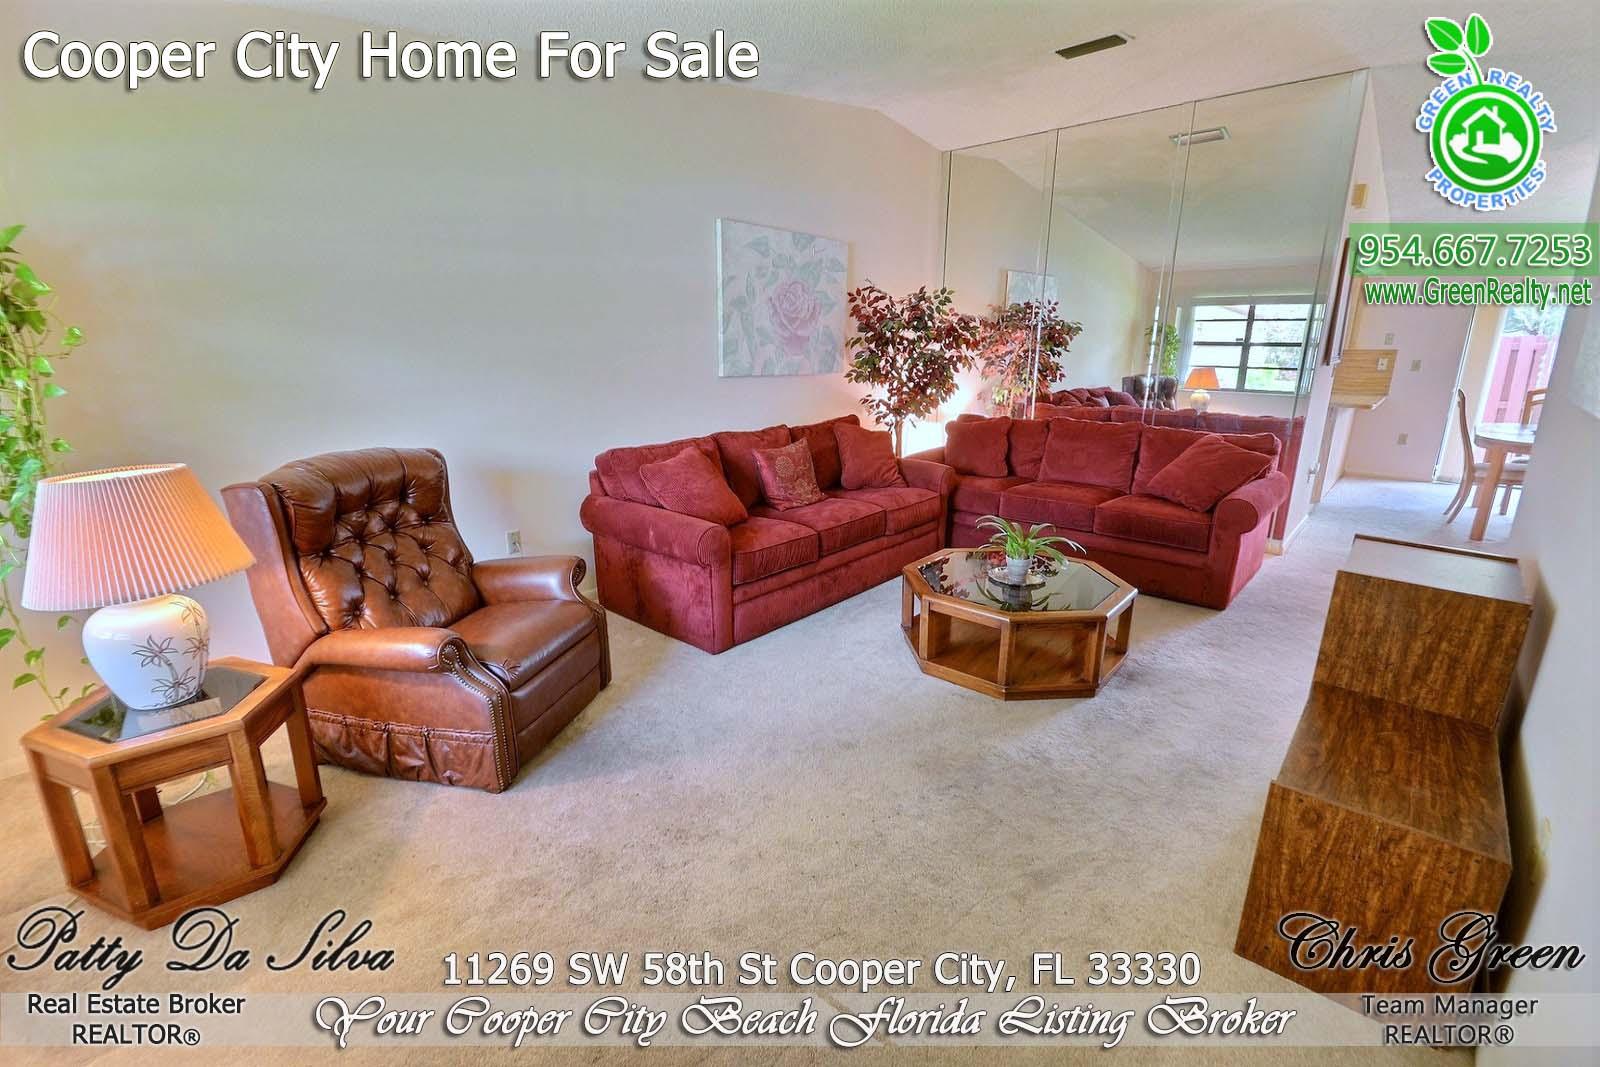 4 Cooper City Real Estate - Villas (9)